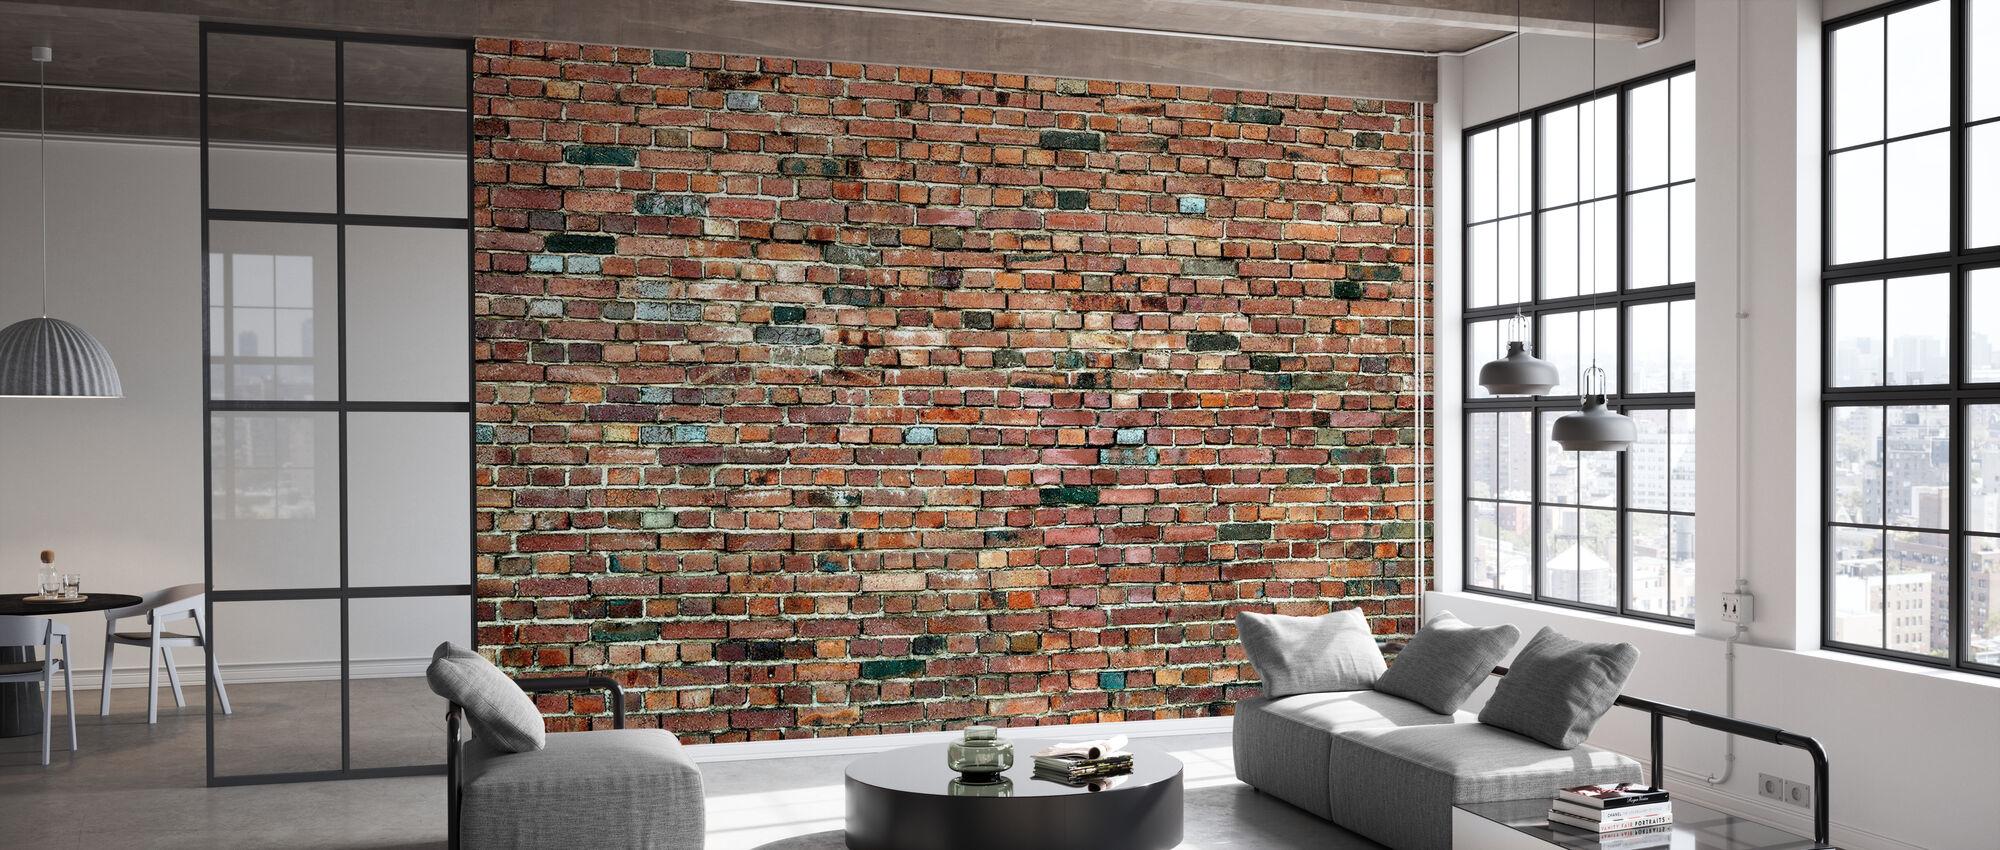 Stockholm Brick Wall - Wallpaper - Office